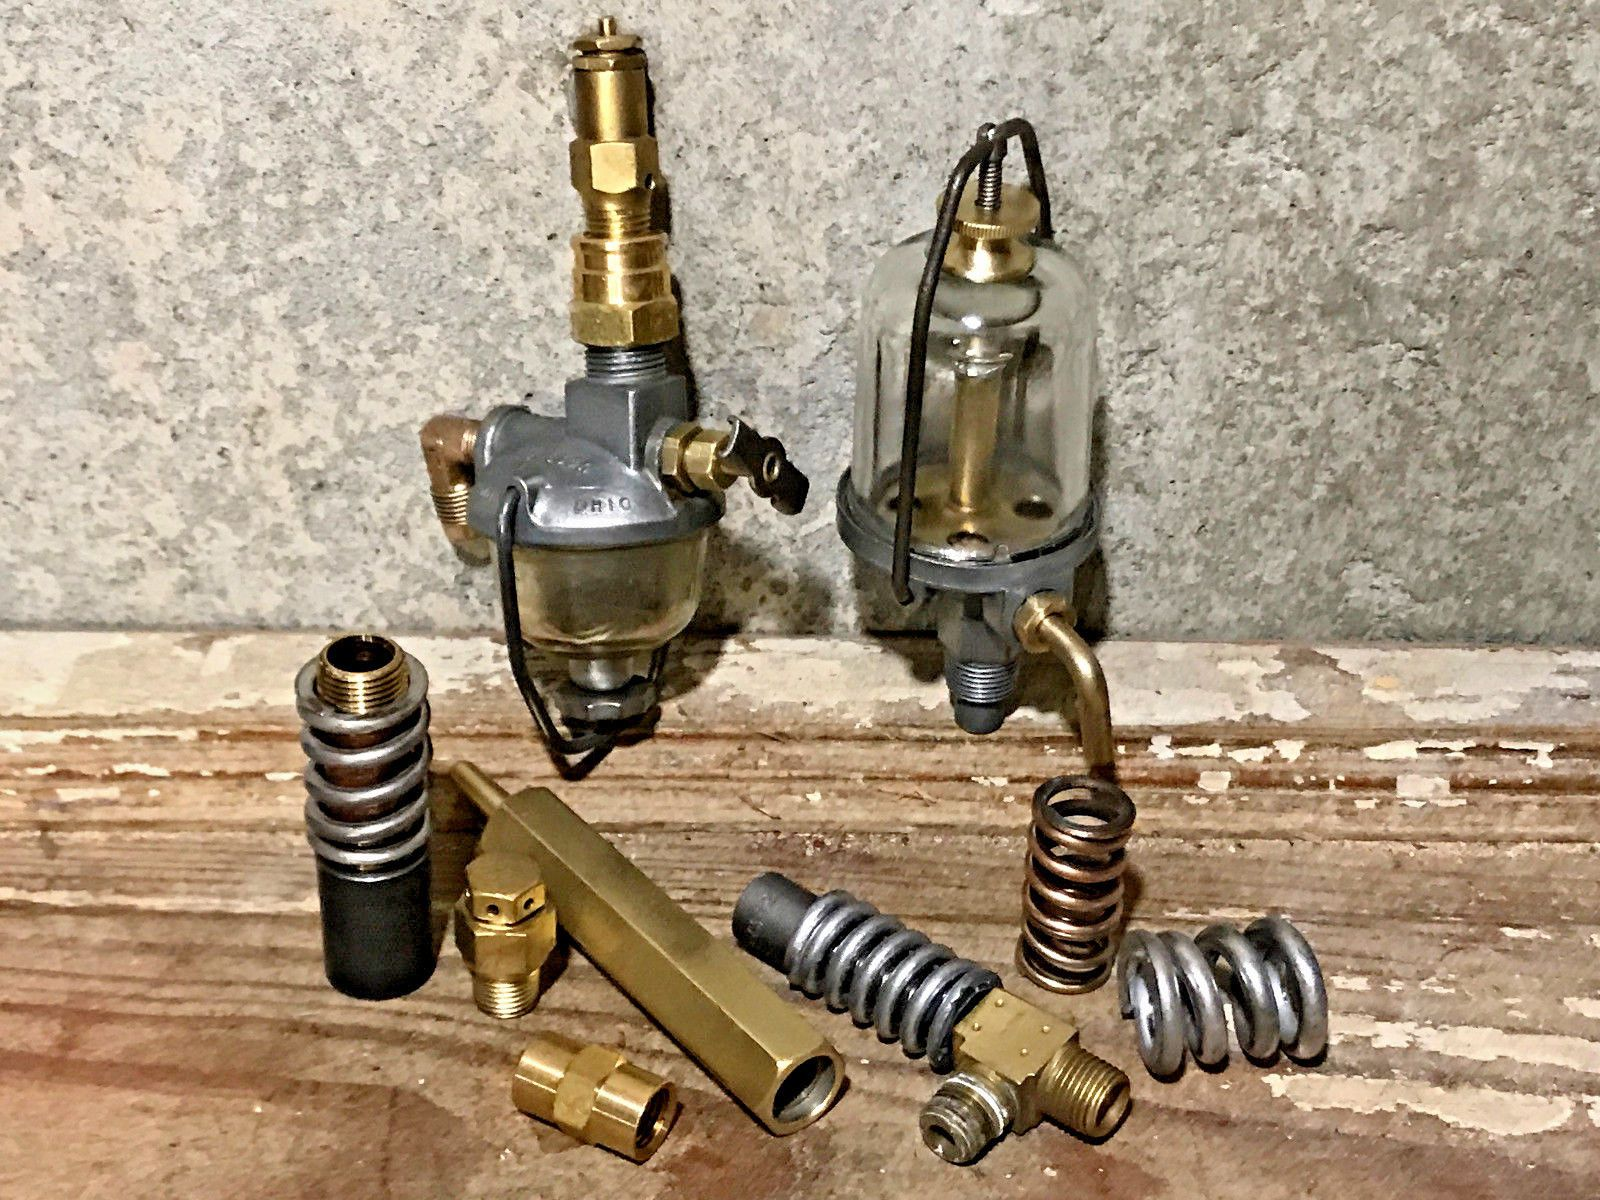 medium resolution of vintage brass steampunk lamp part lot fuel filter pressure valve gauge fitting